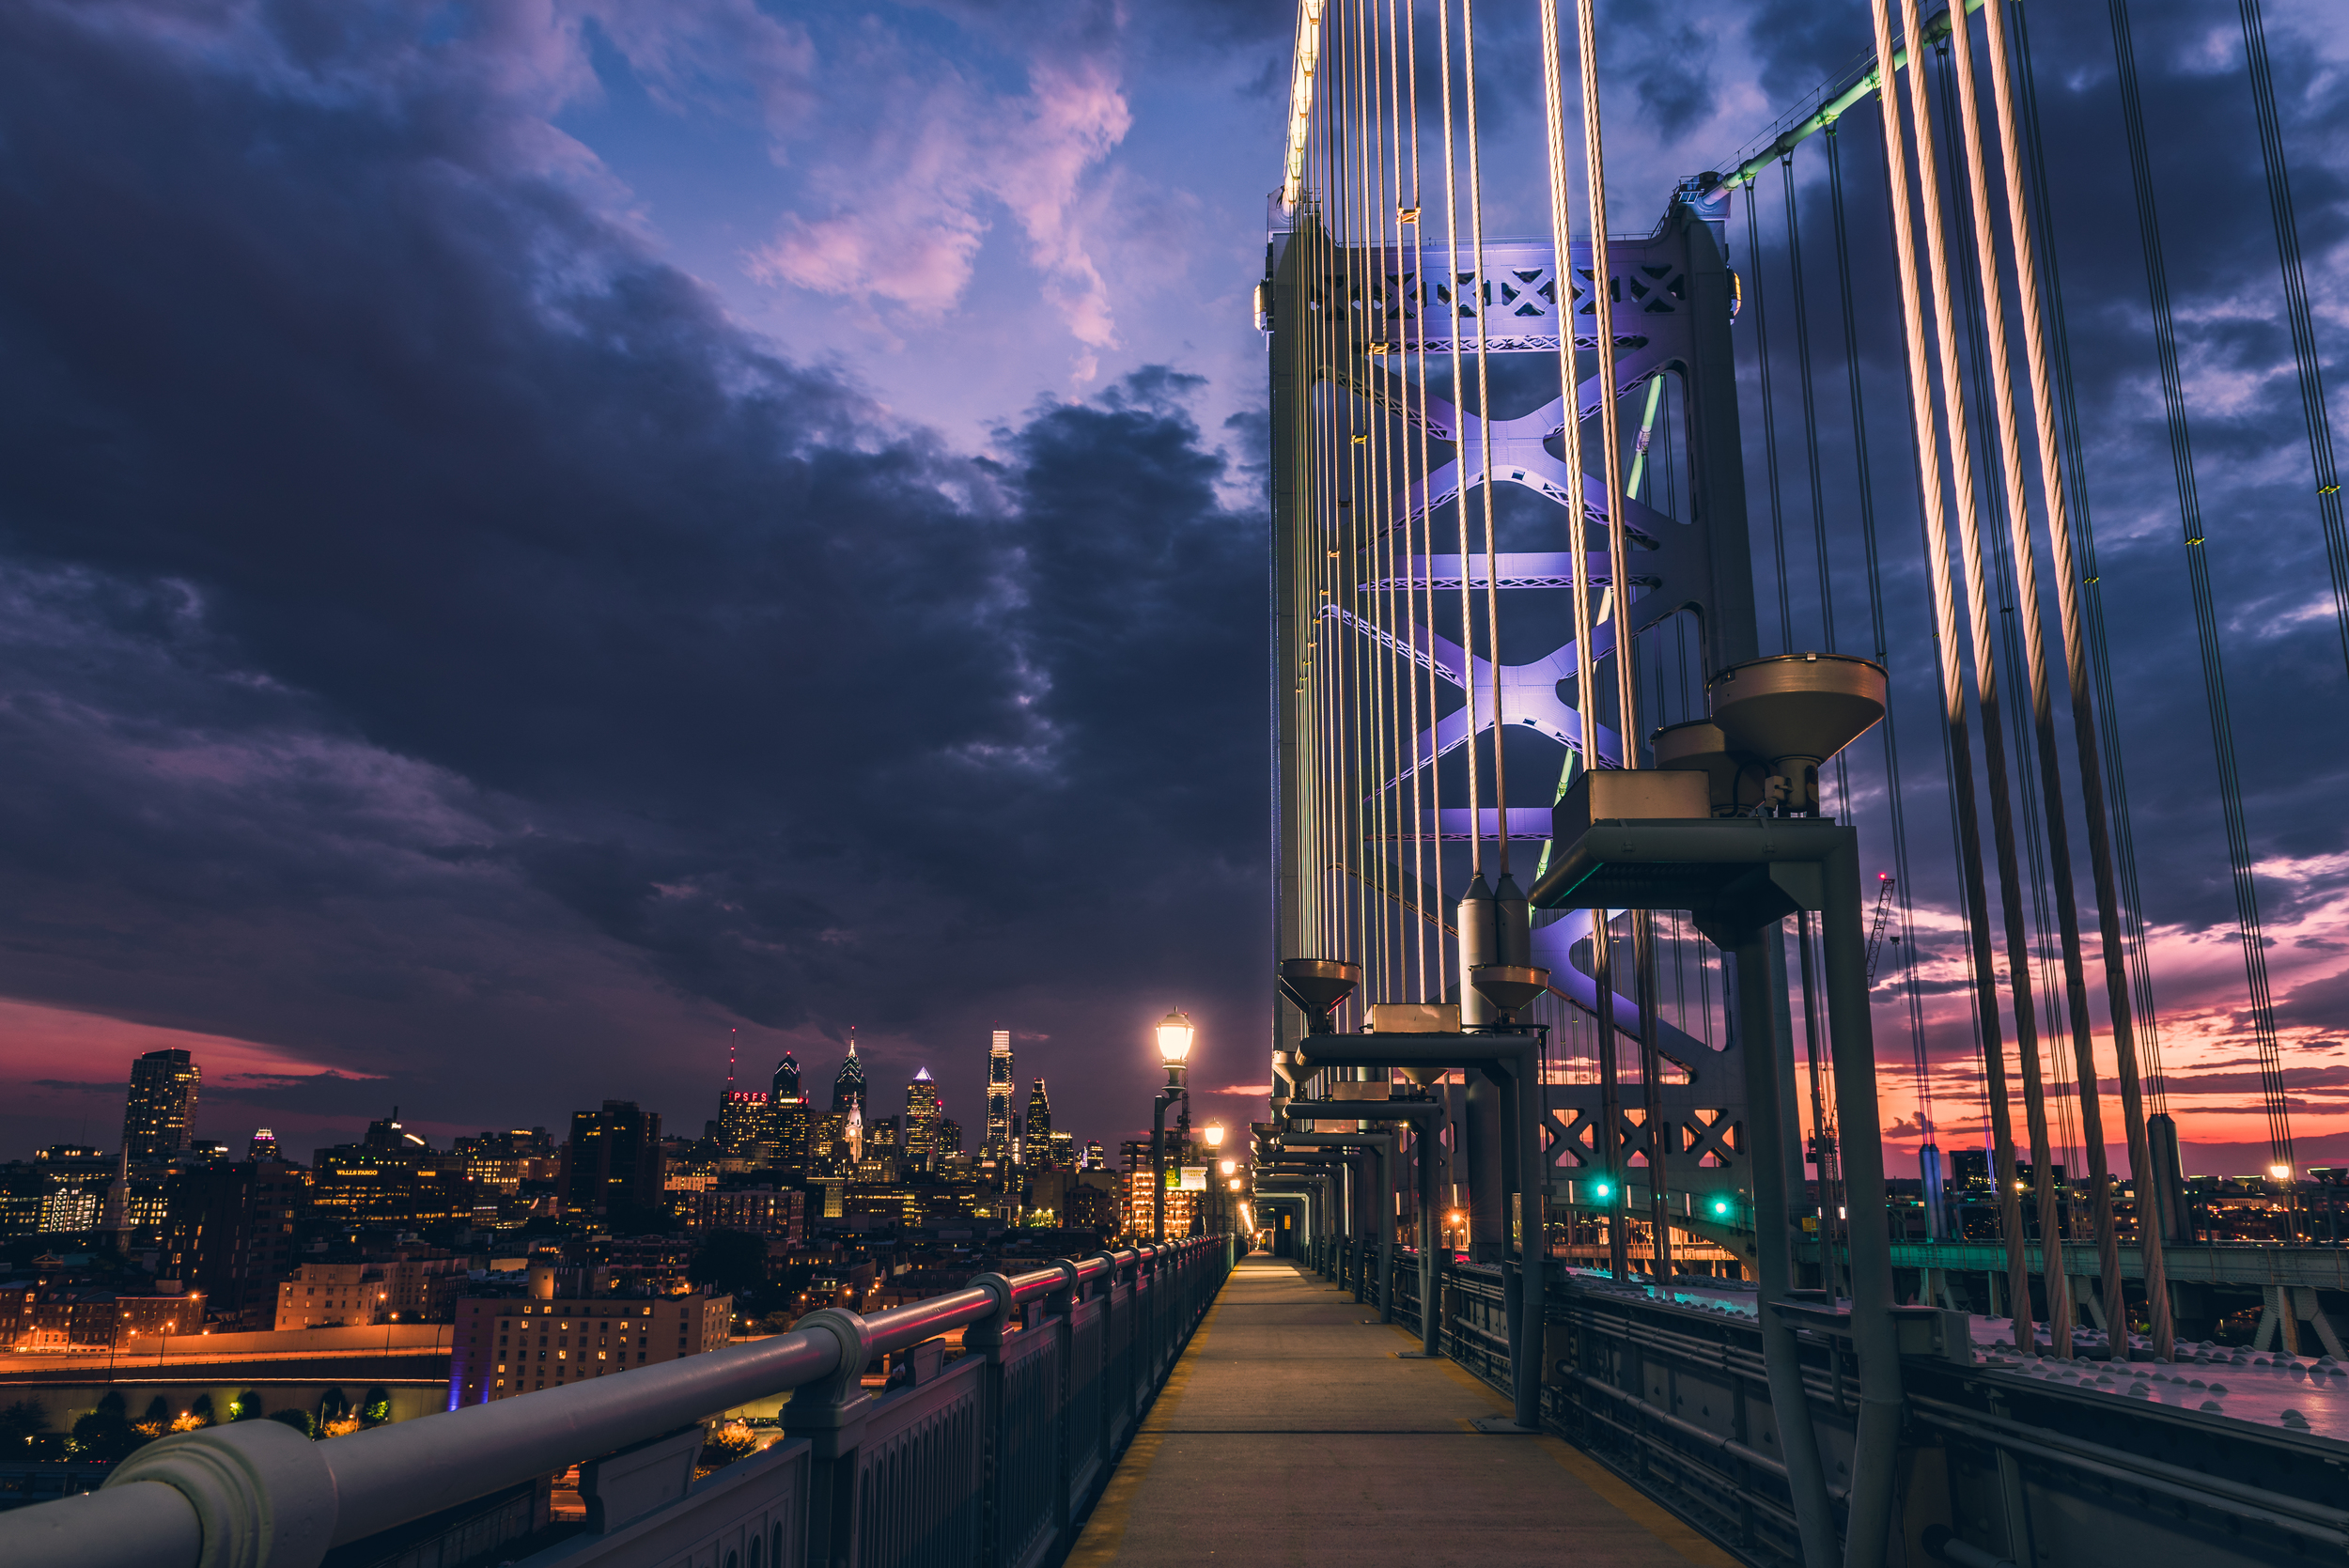 20160626 - Philly Skyline LR-3.jpg